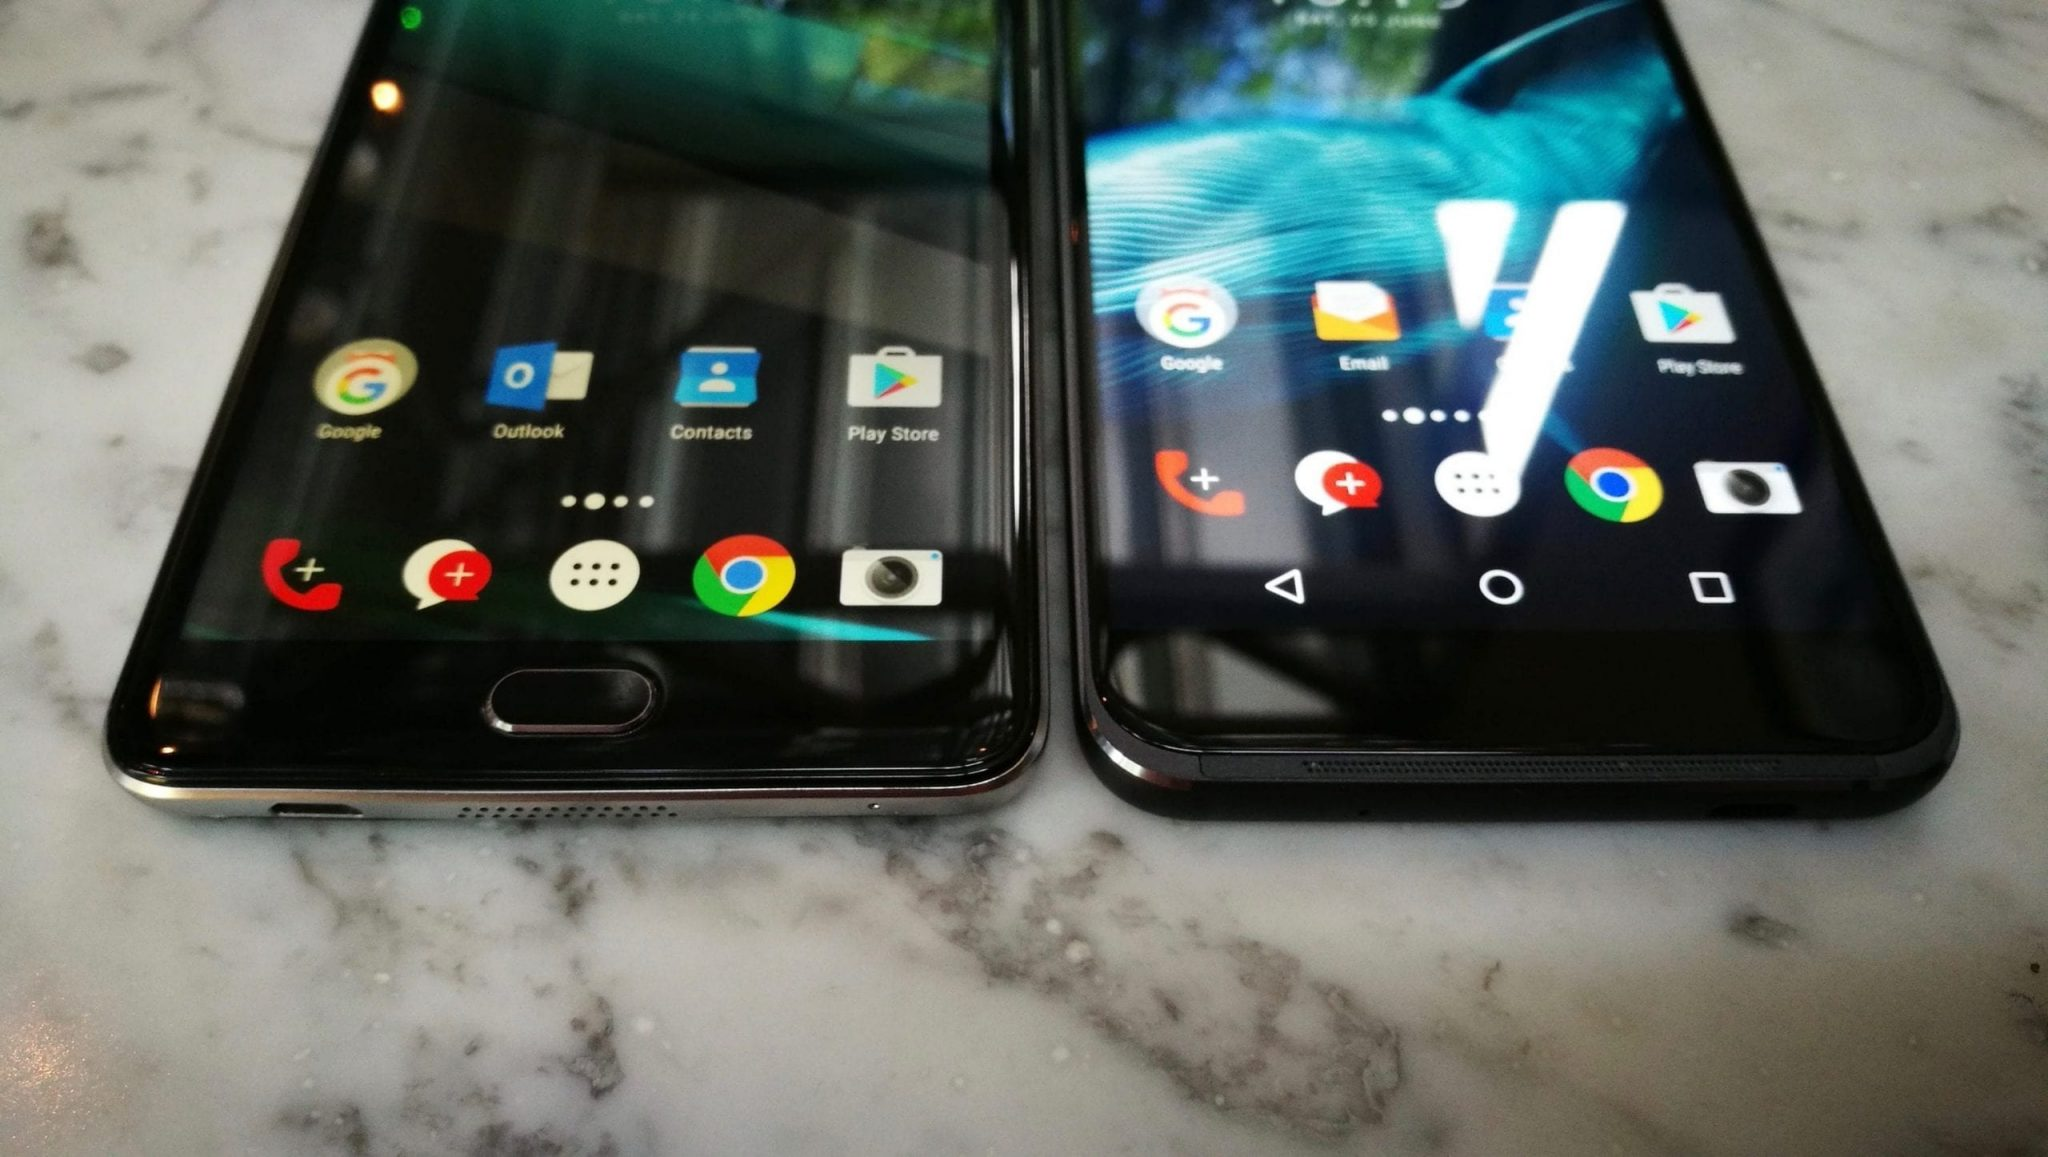 Vodafone Smart Ultra 7 left - Smart Platinum 7 right